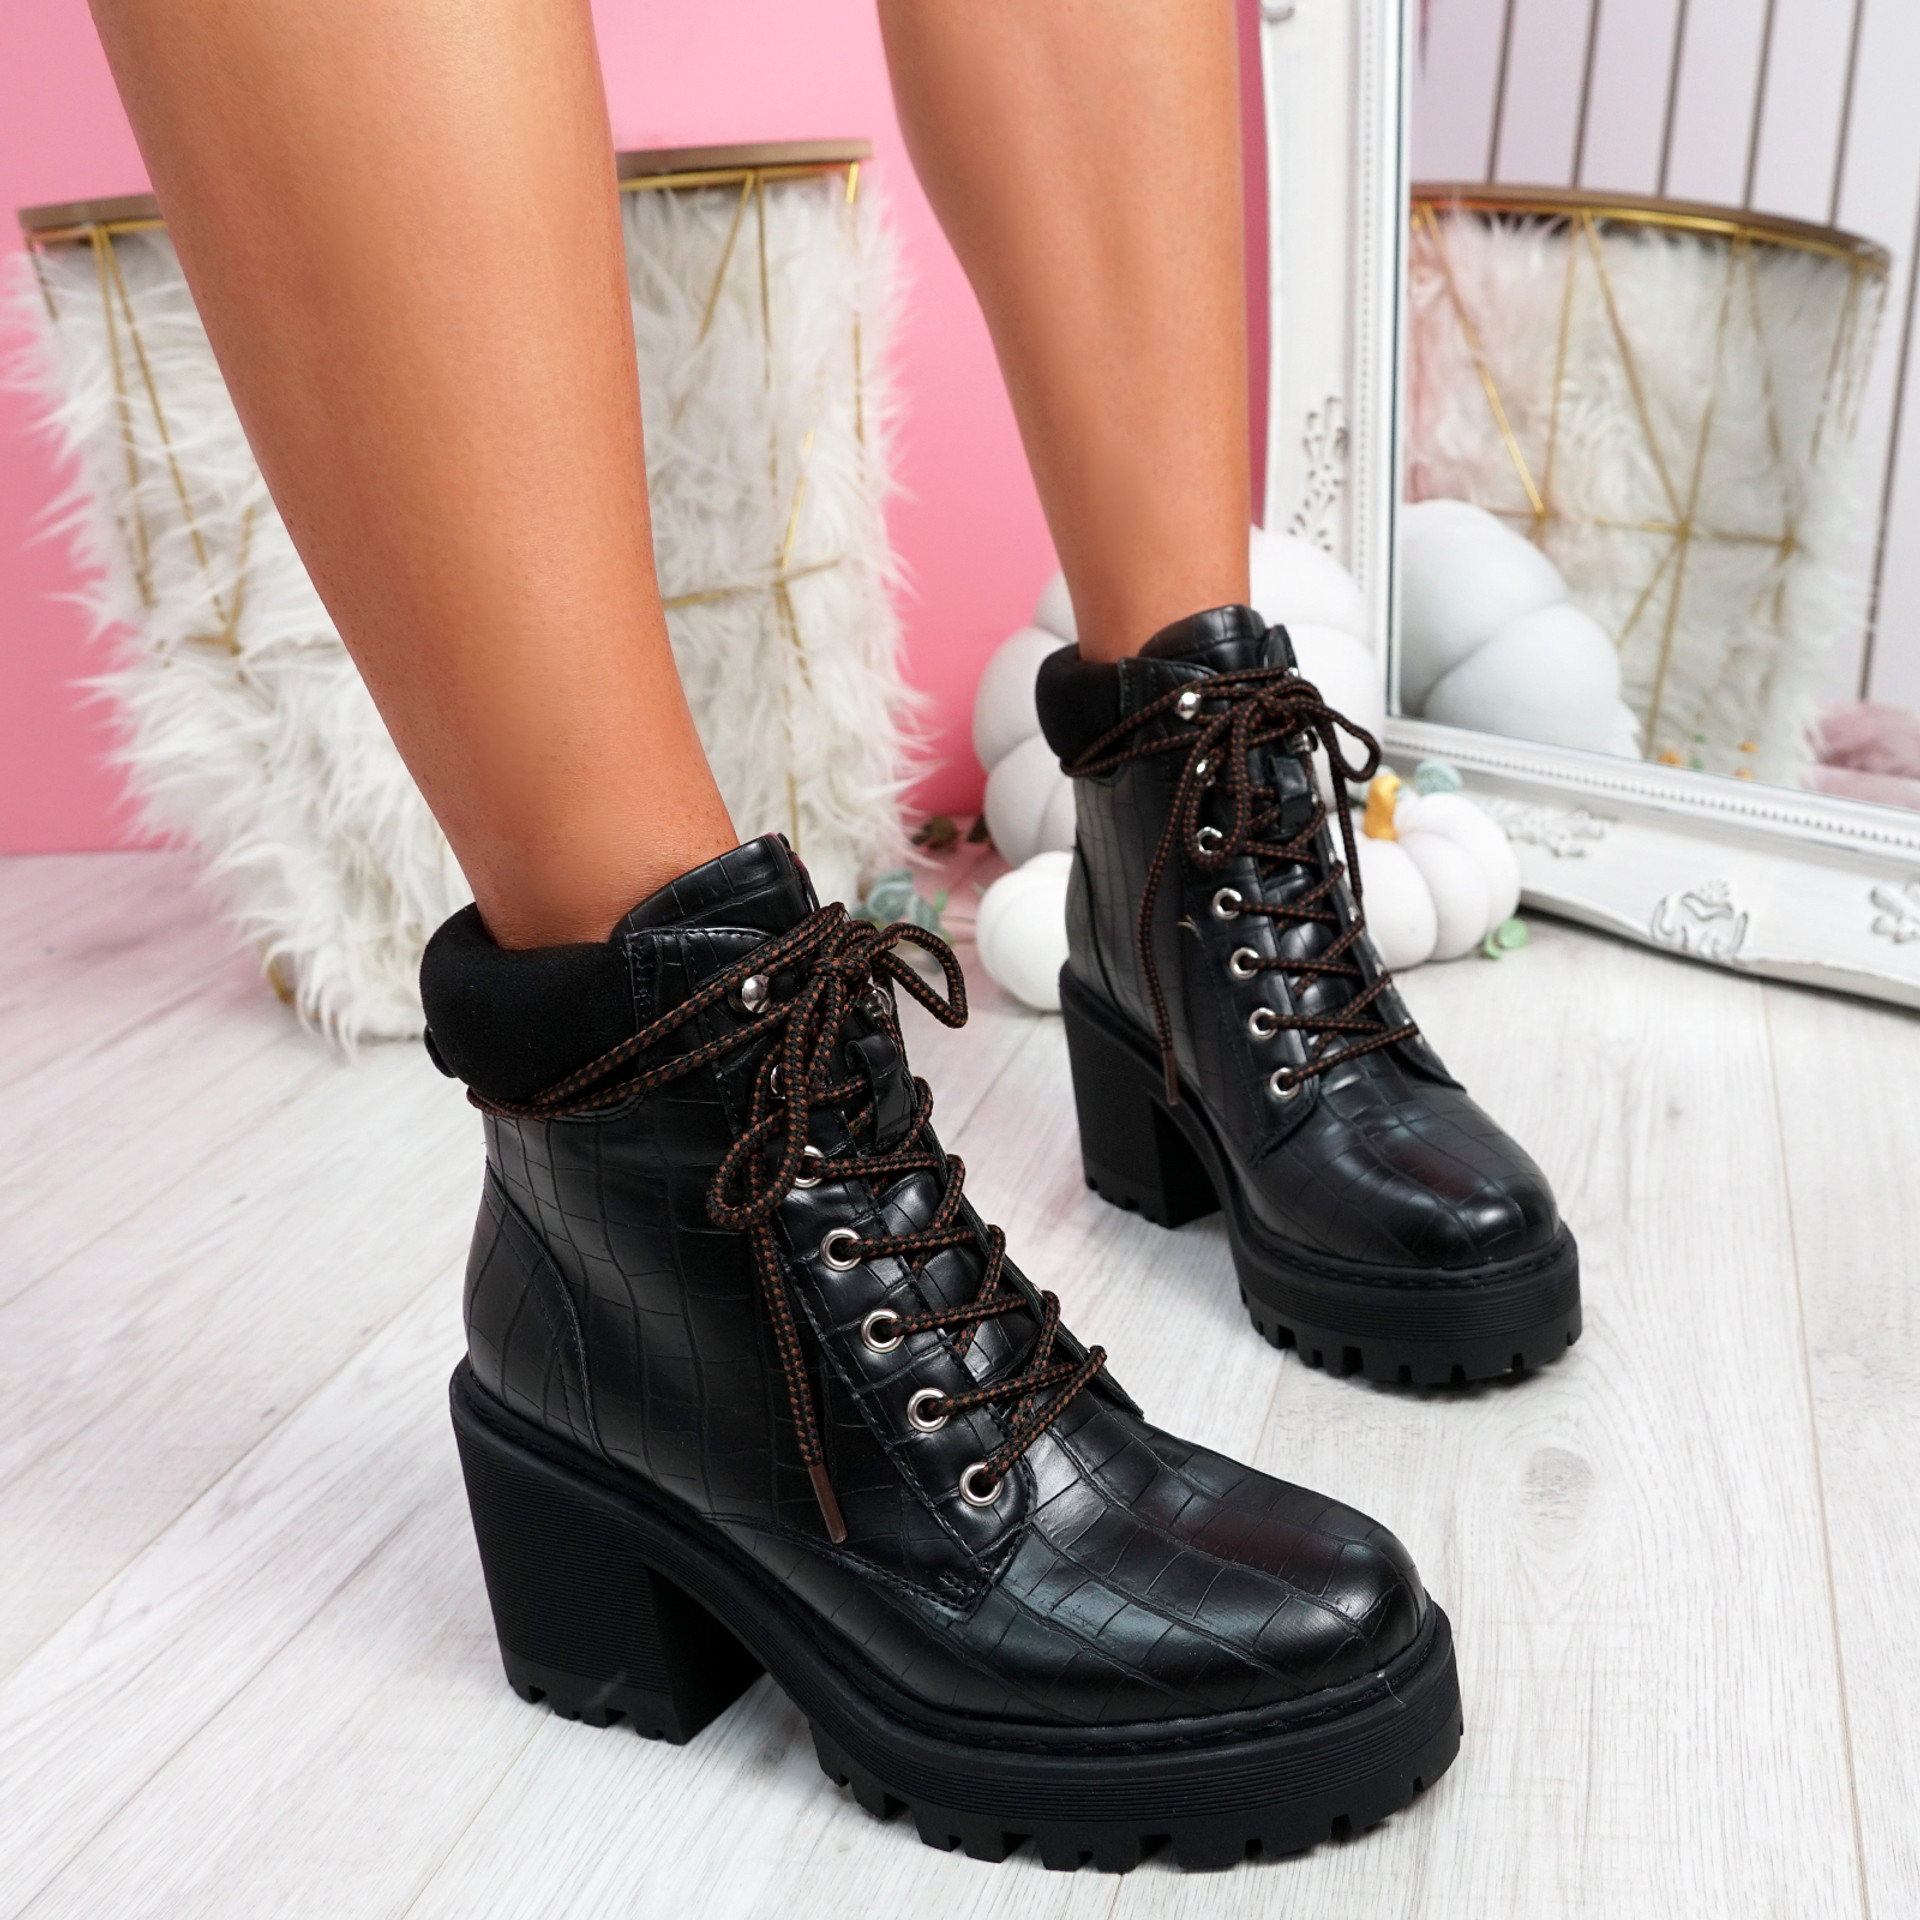 Kofe Black Croc Biker Ankle Boots